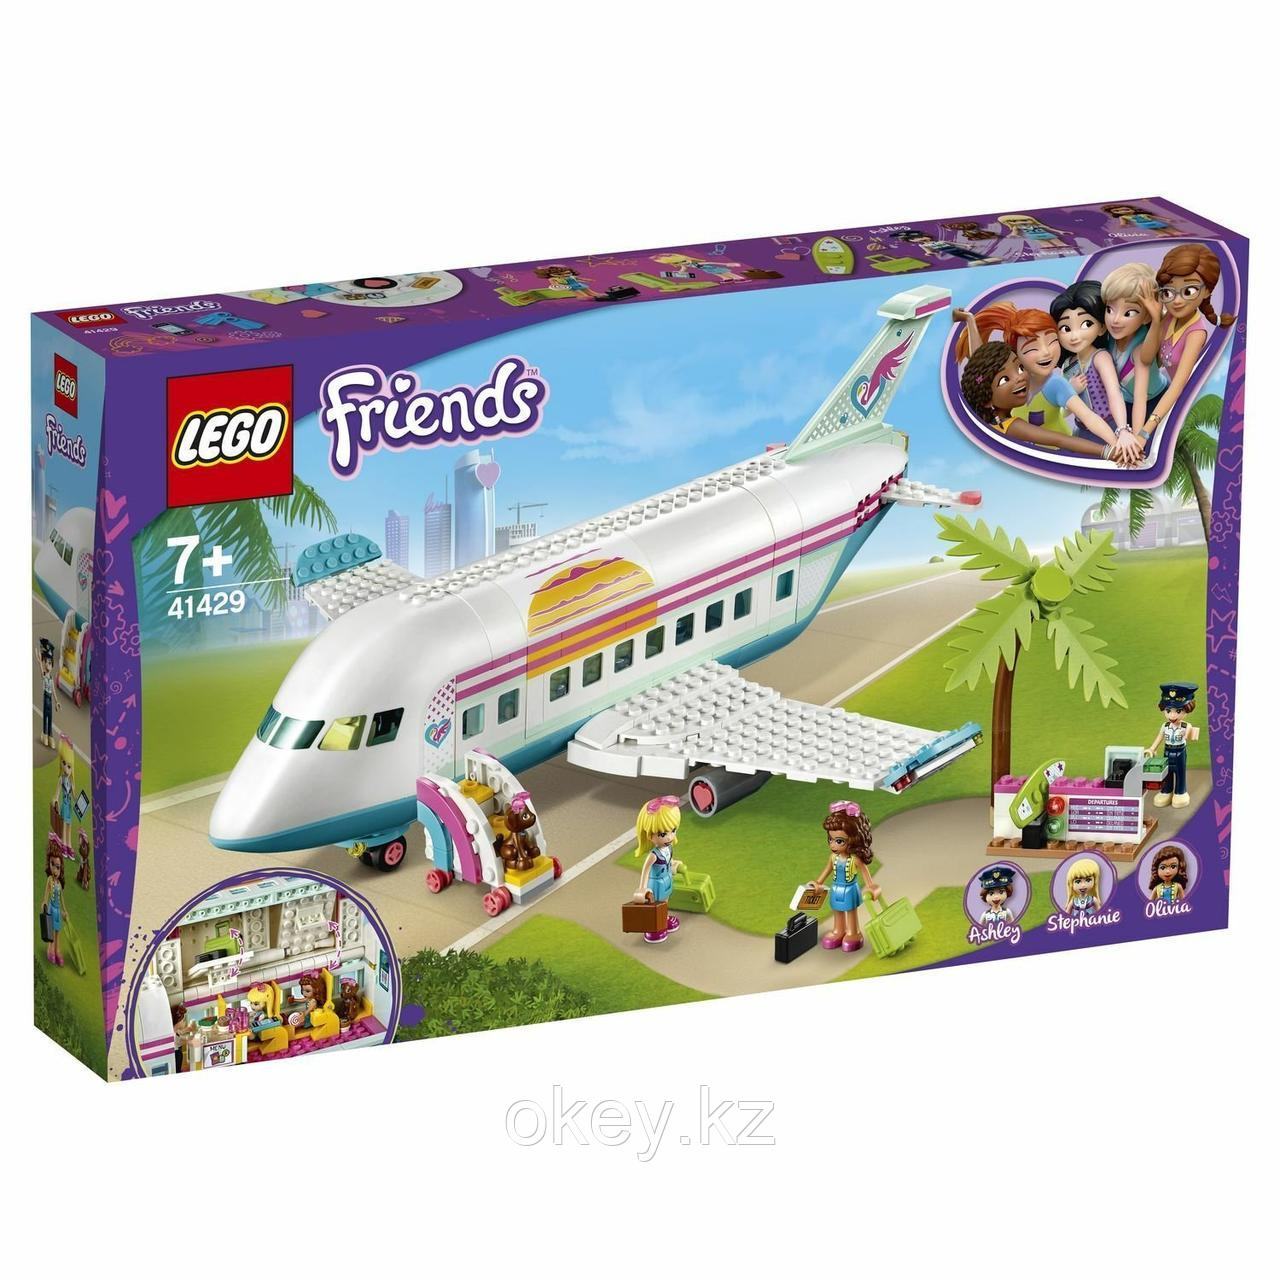 LEGO Friends: Самолёт в Хартлейк Сити 41429 - фото 1